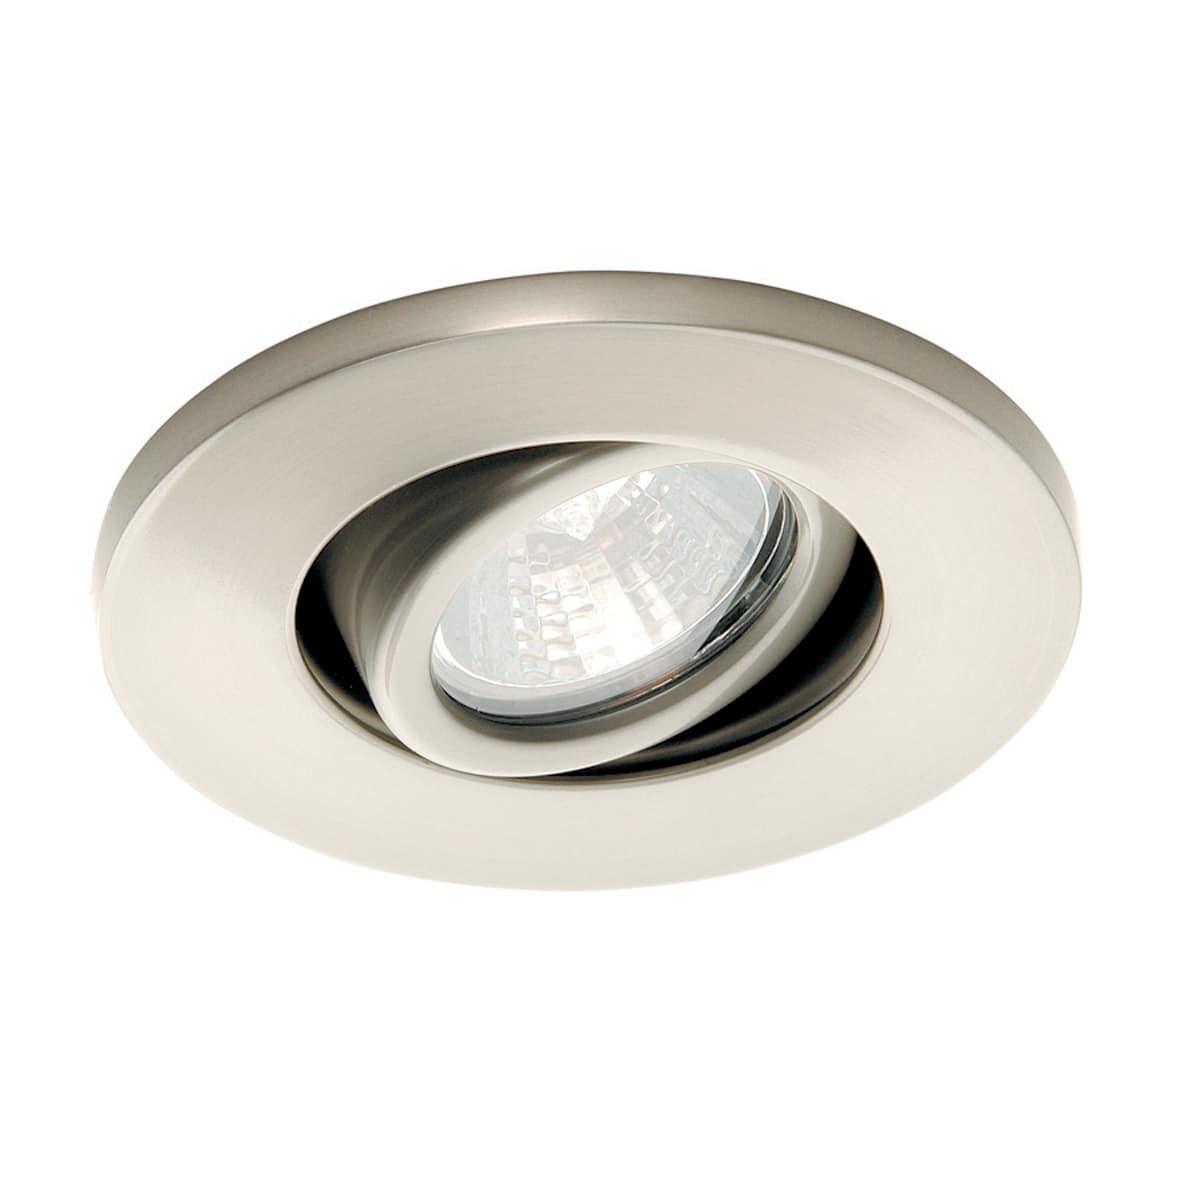 Wac Lighting Hr 1137 Bn Brushed Nickel 2 75 Wide 1 Light